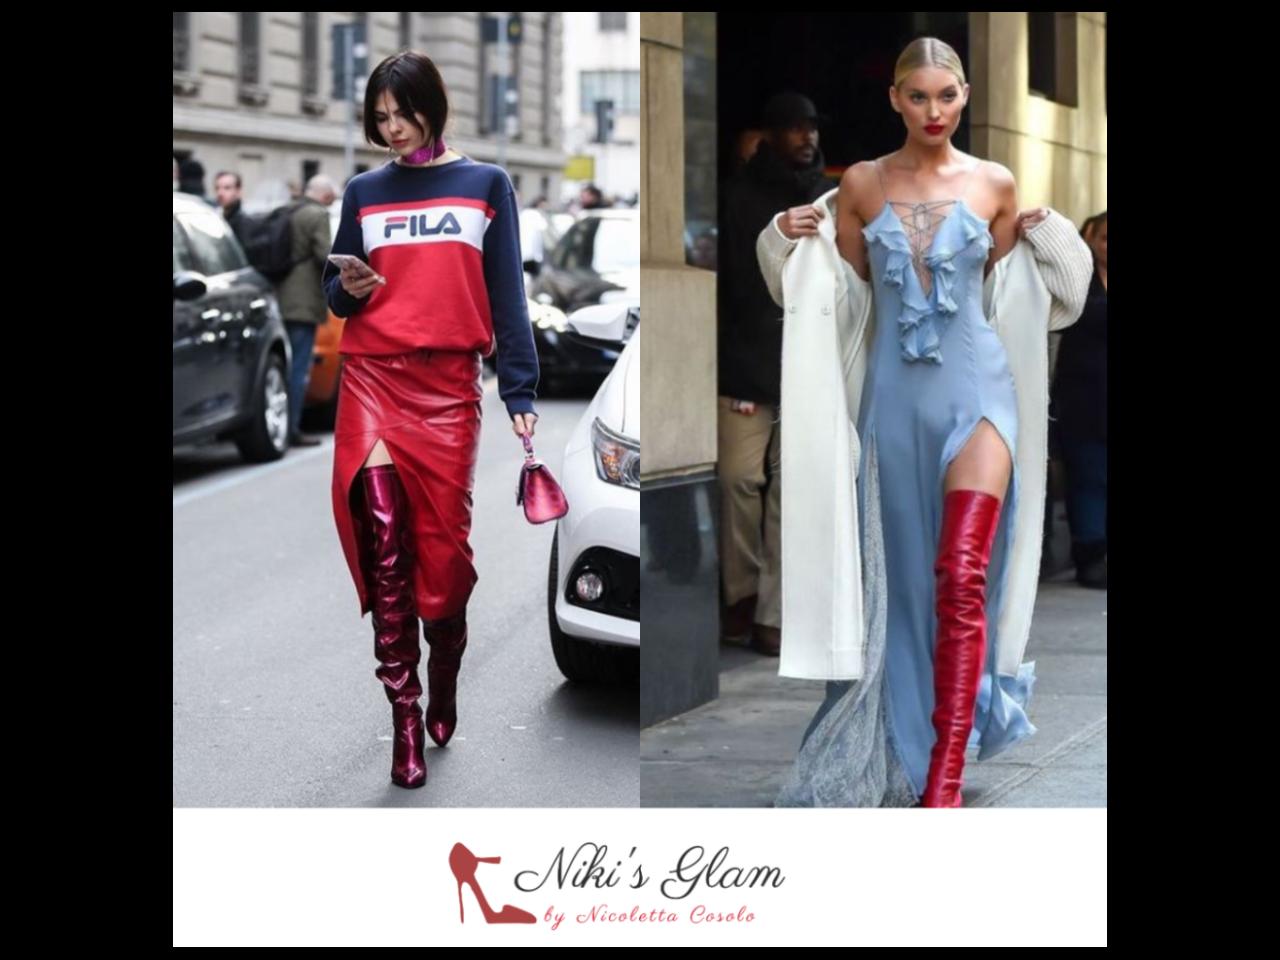 J'adore les cuissardes - Niki's Glam Blog